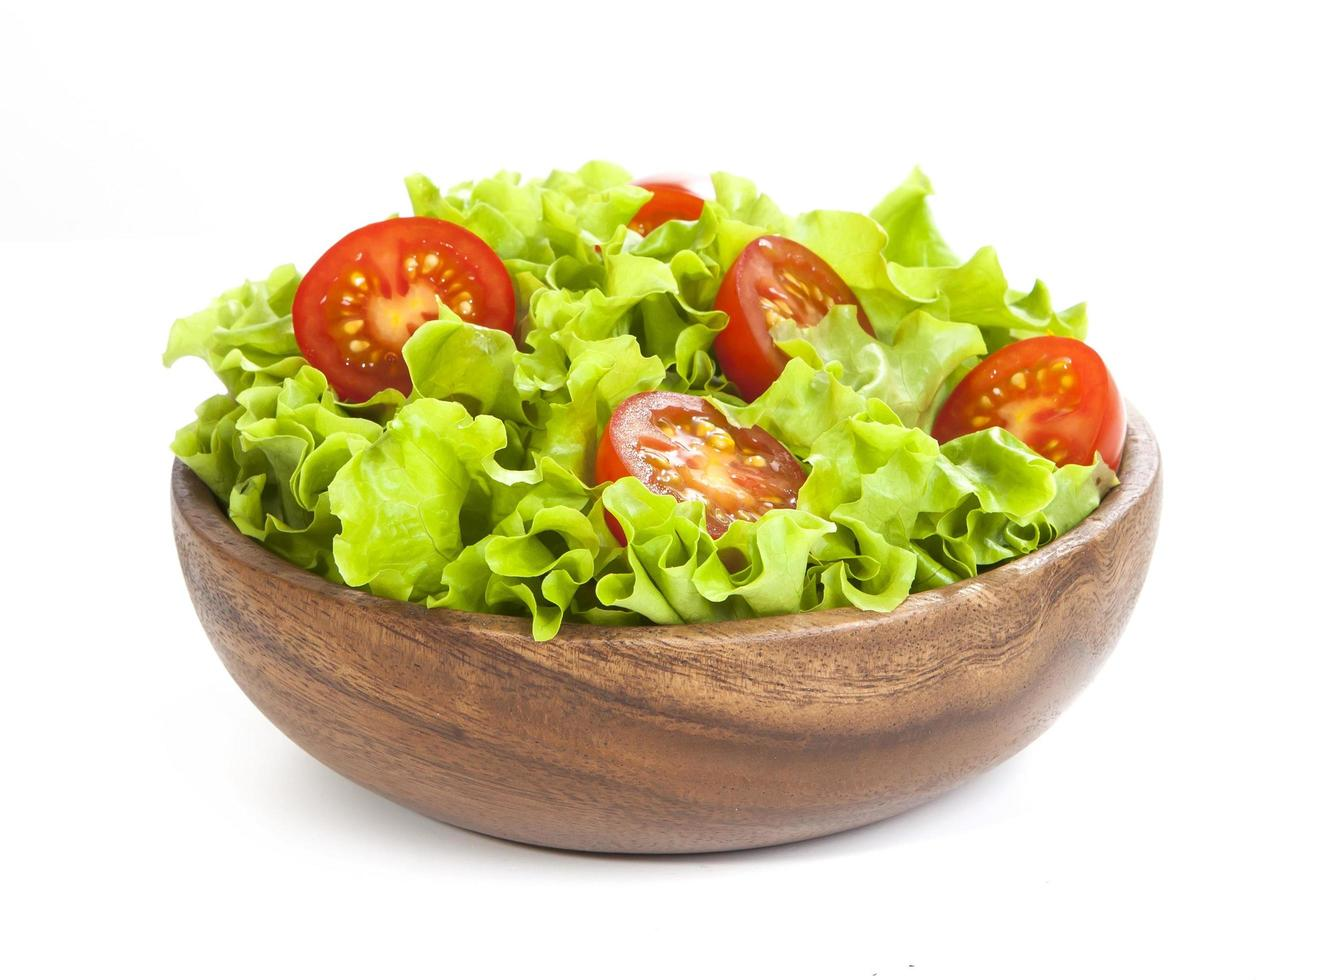 Tomato and lettuce isolated on white background photo